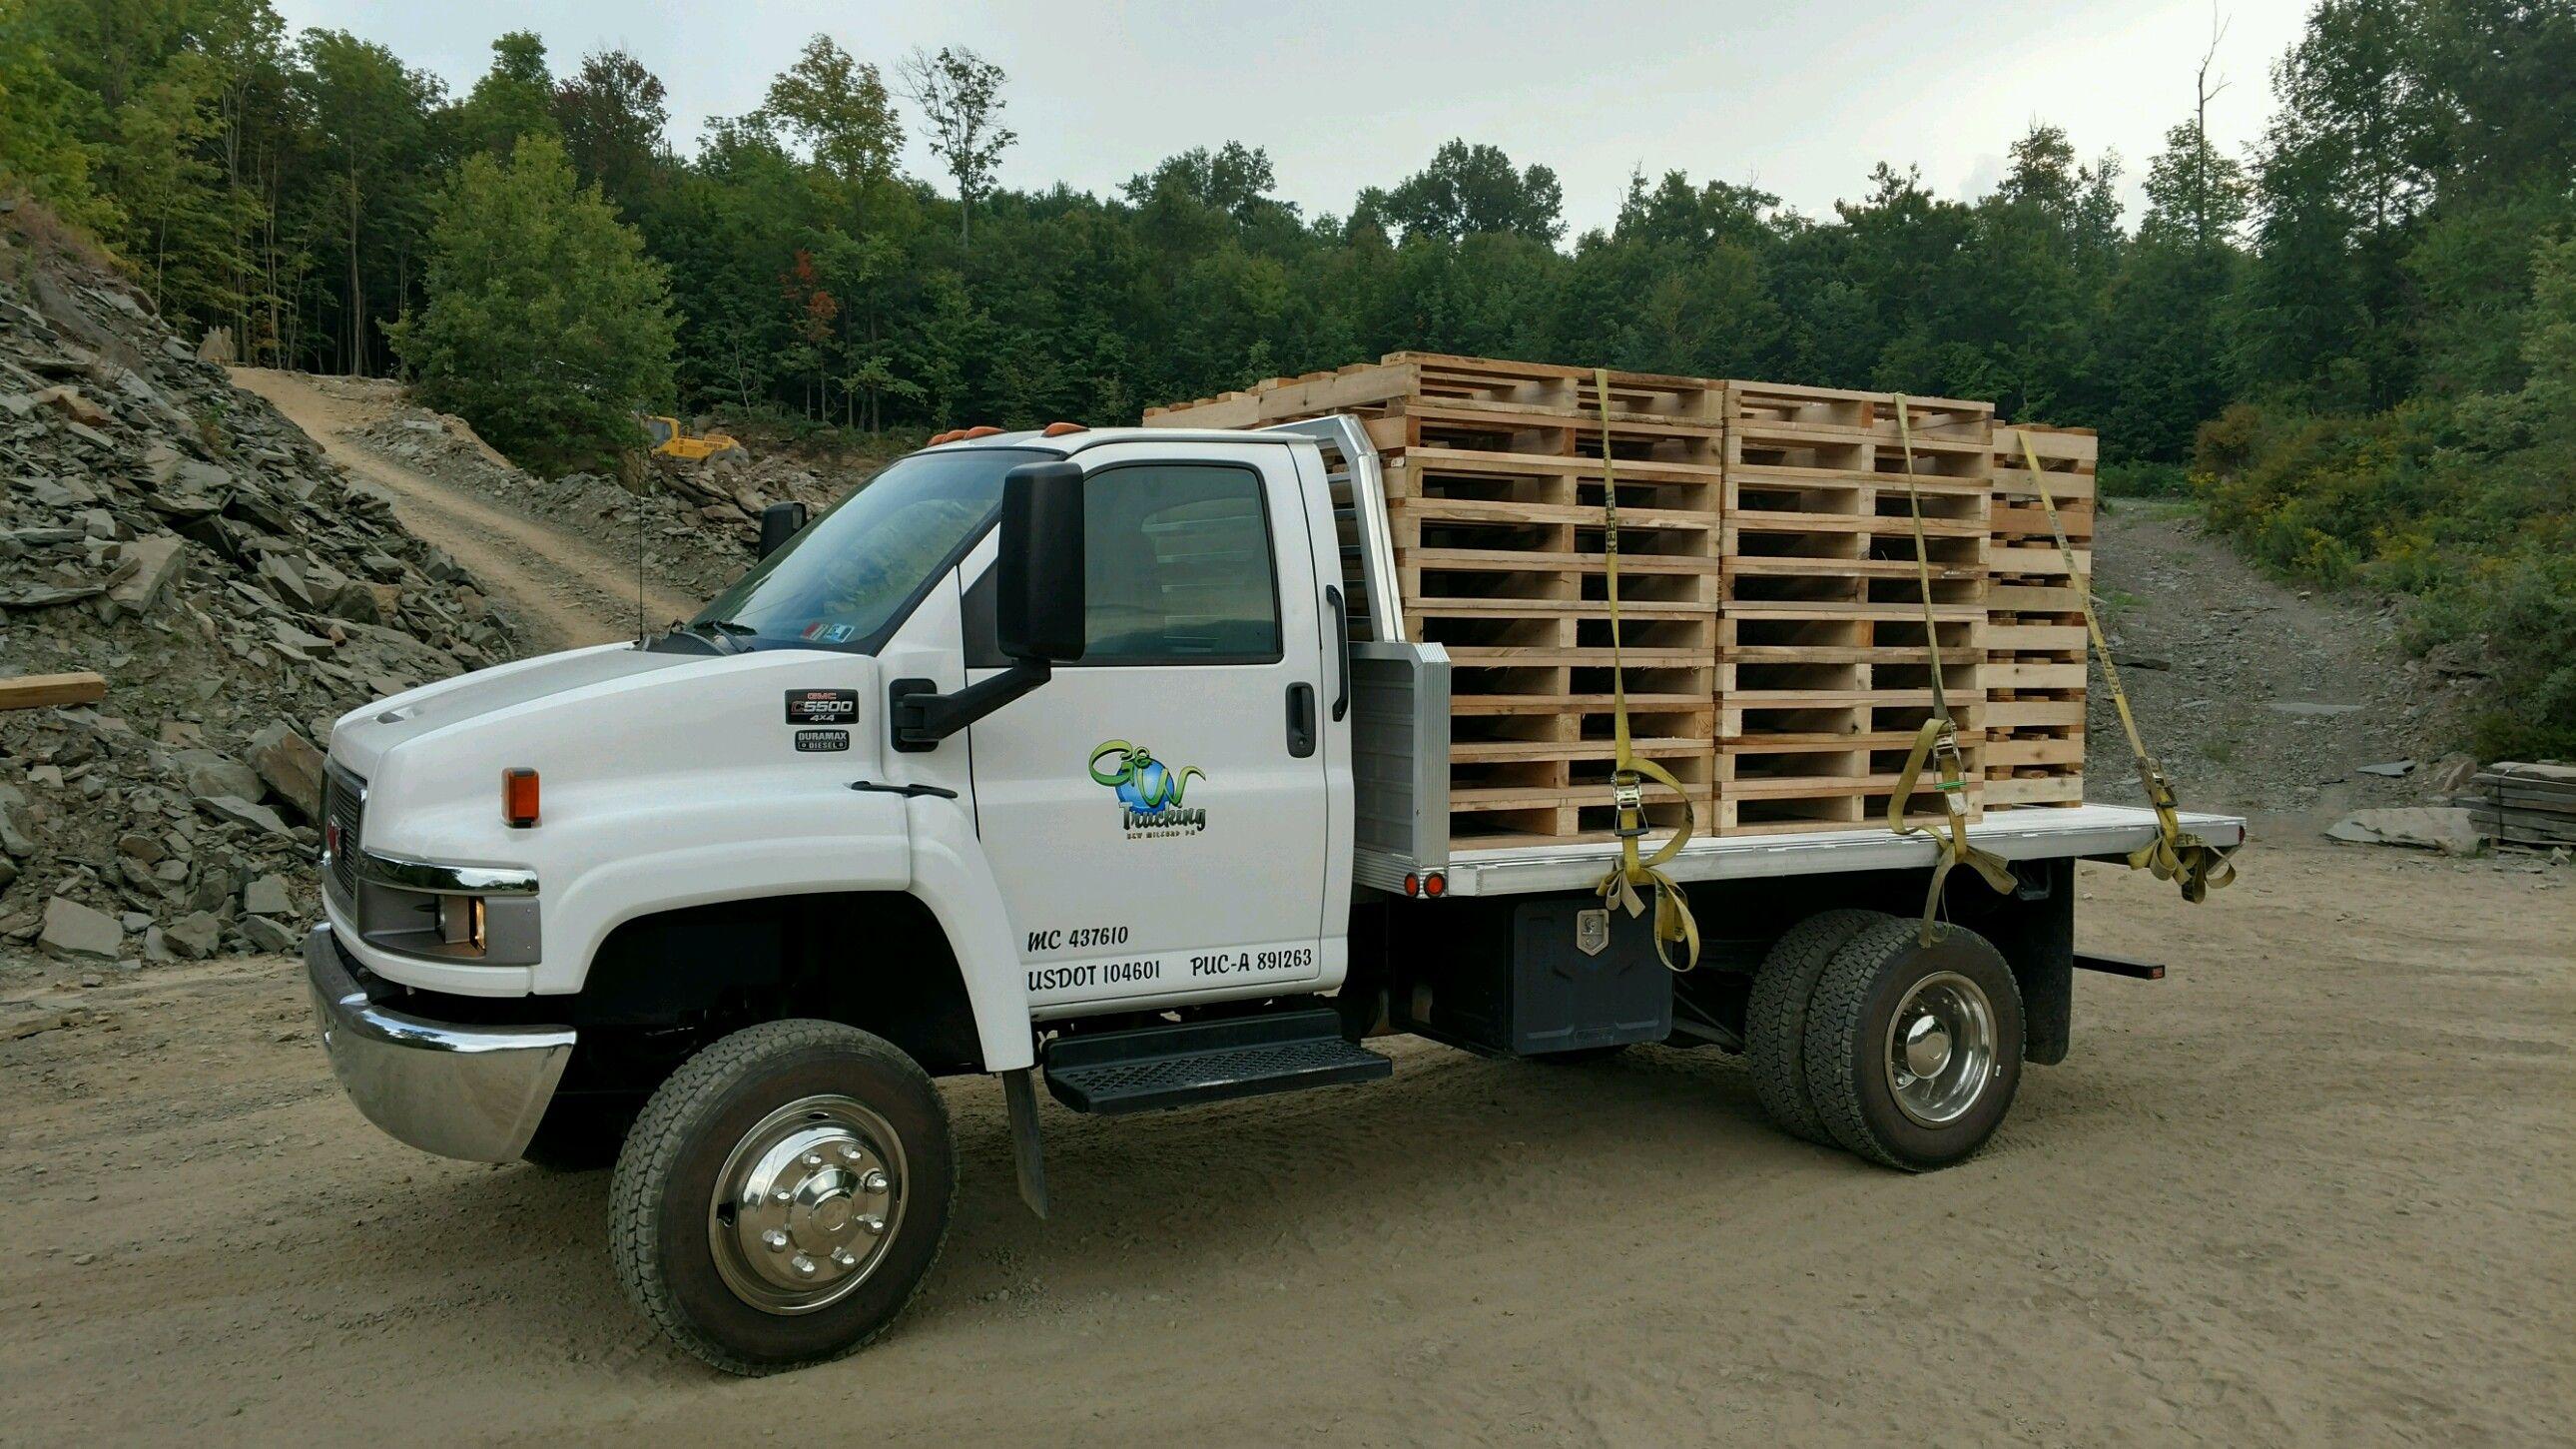 Gmc 6500 Dump Truck >> Gmc Topkick Commercial Trucks Trailers For Sale Used .html   Autos Weblog